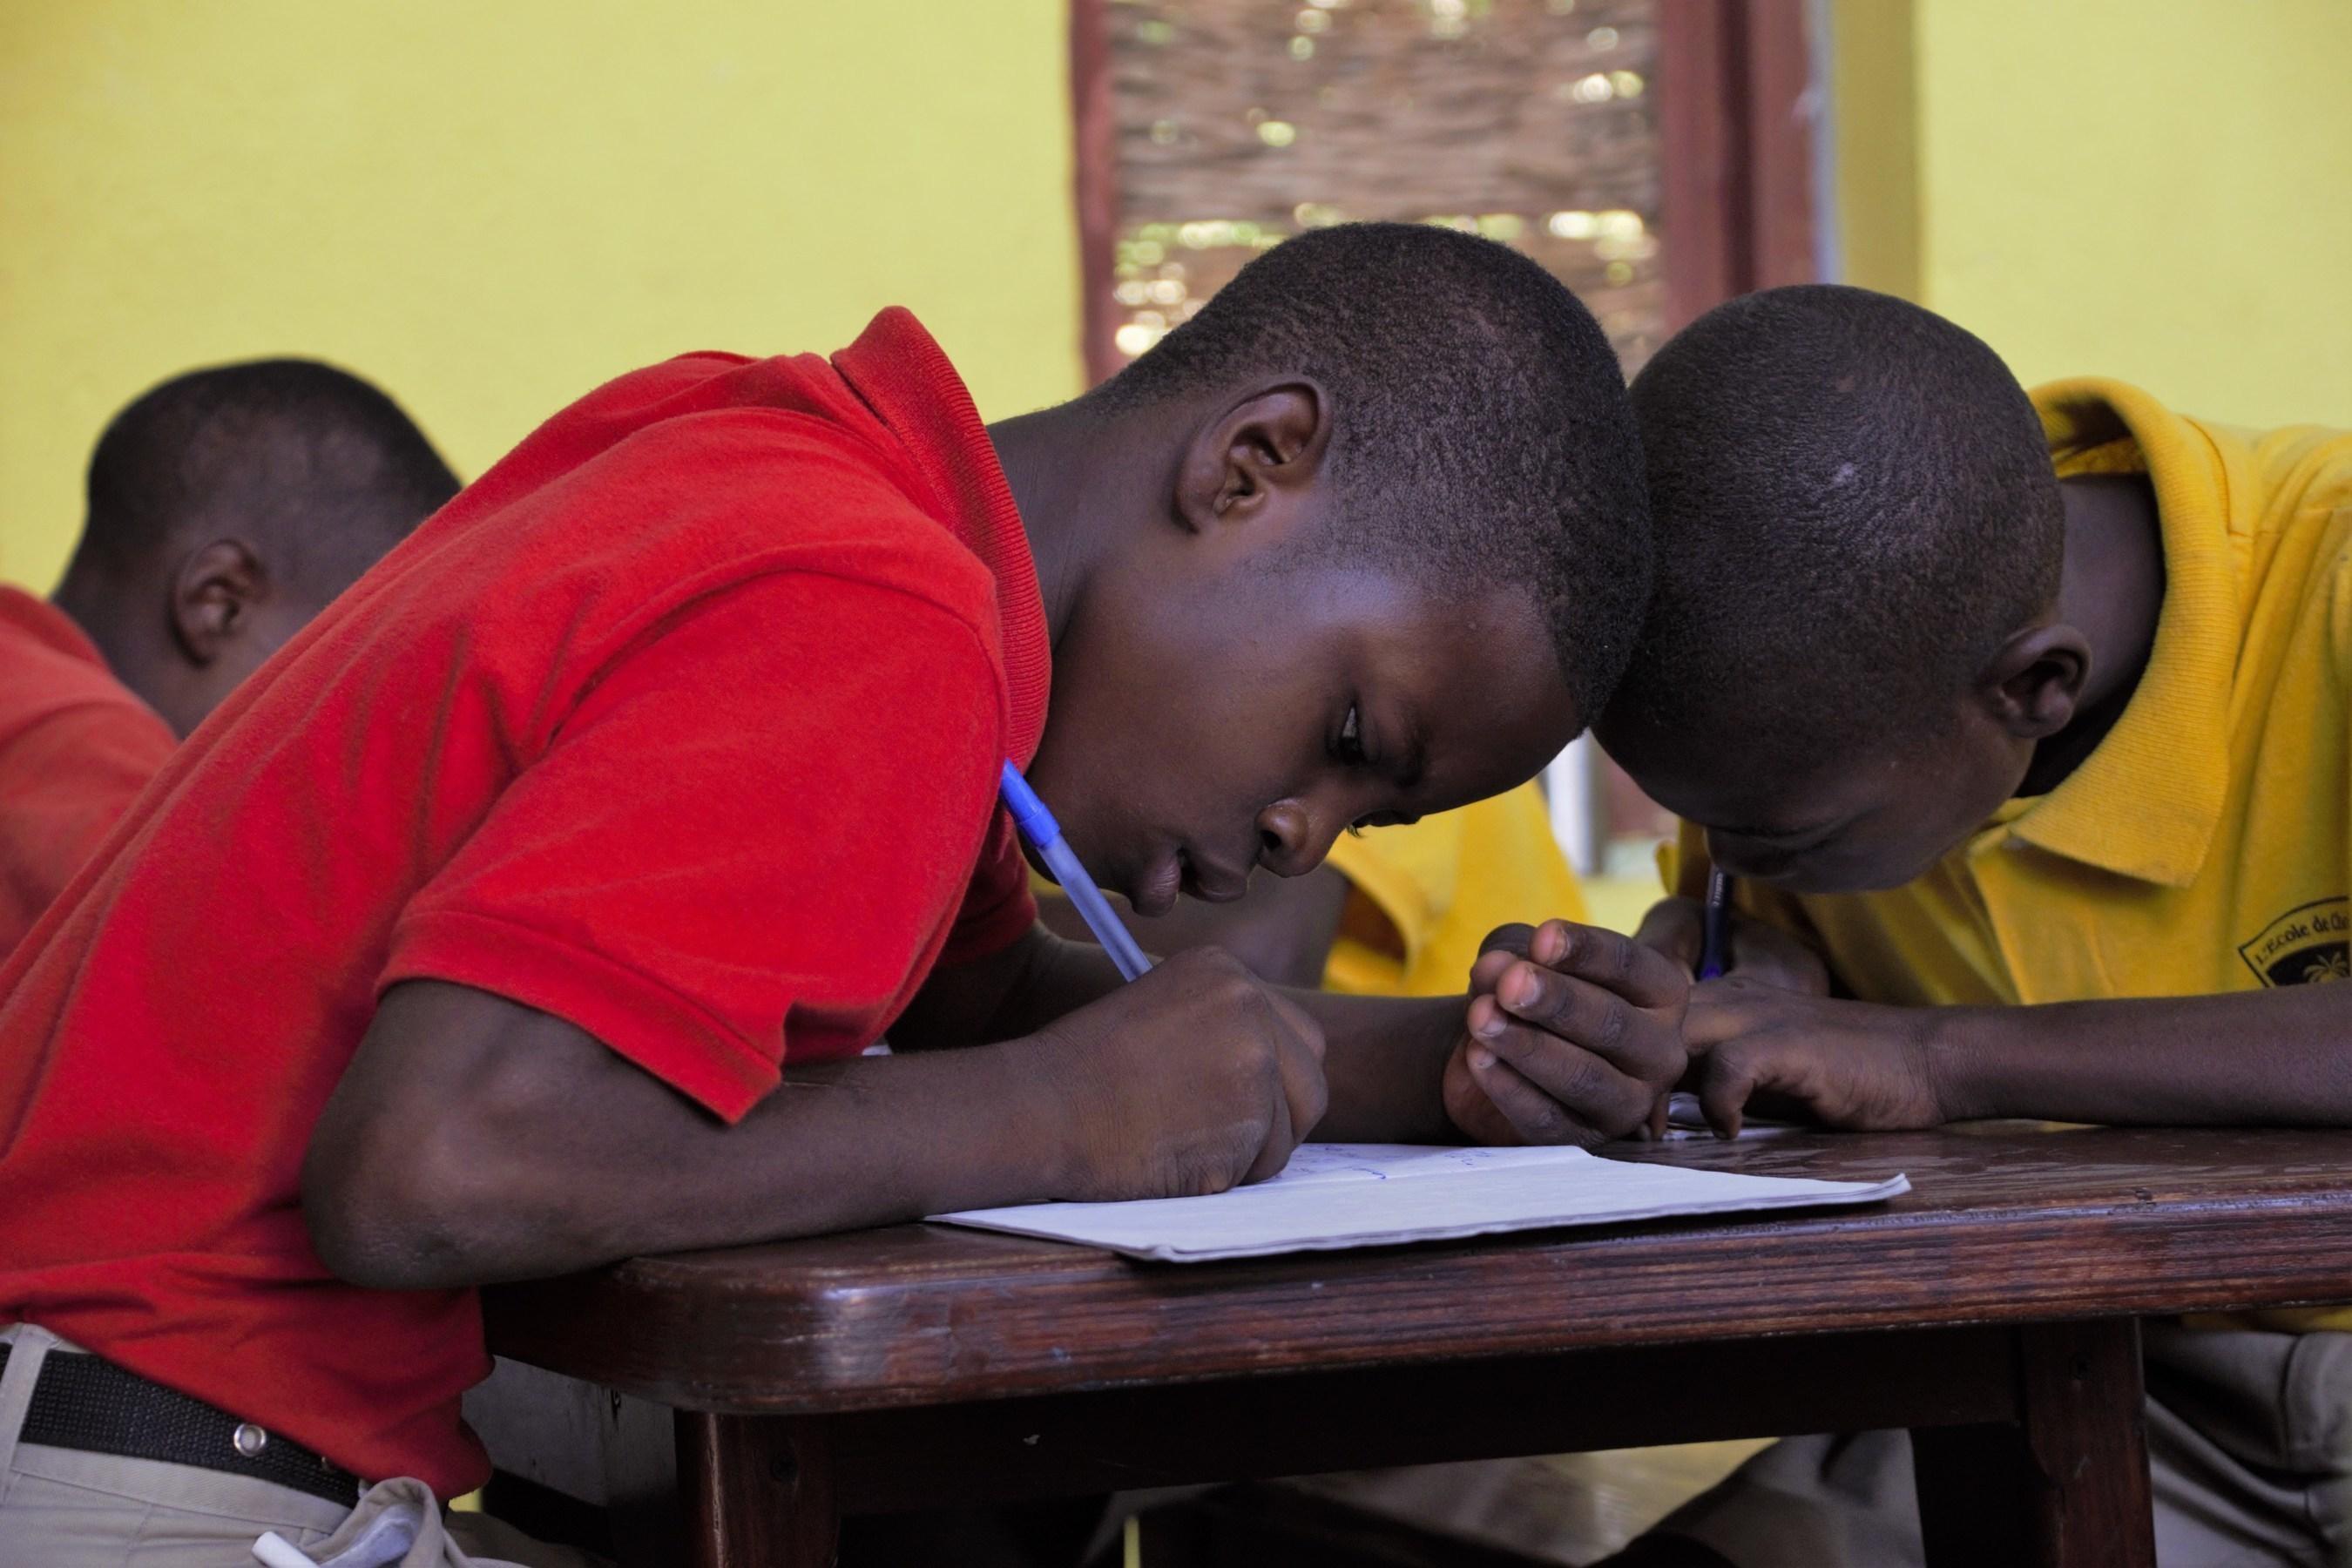 Future leaders study at L'Ecole de Choix school in Mirebelais, Haiti.